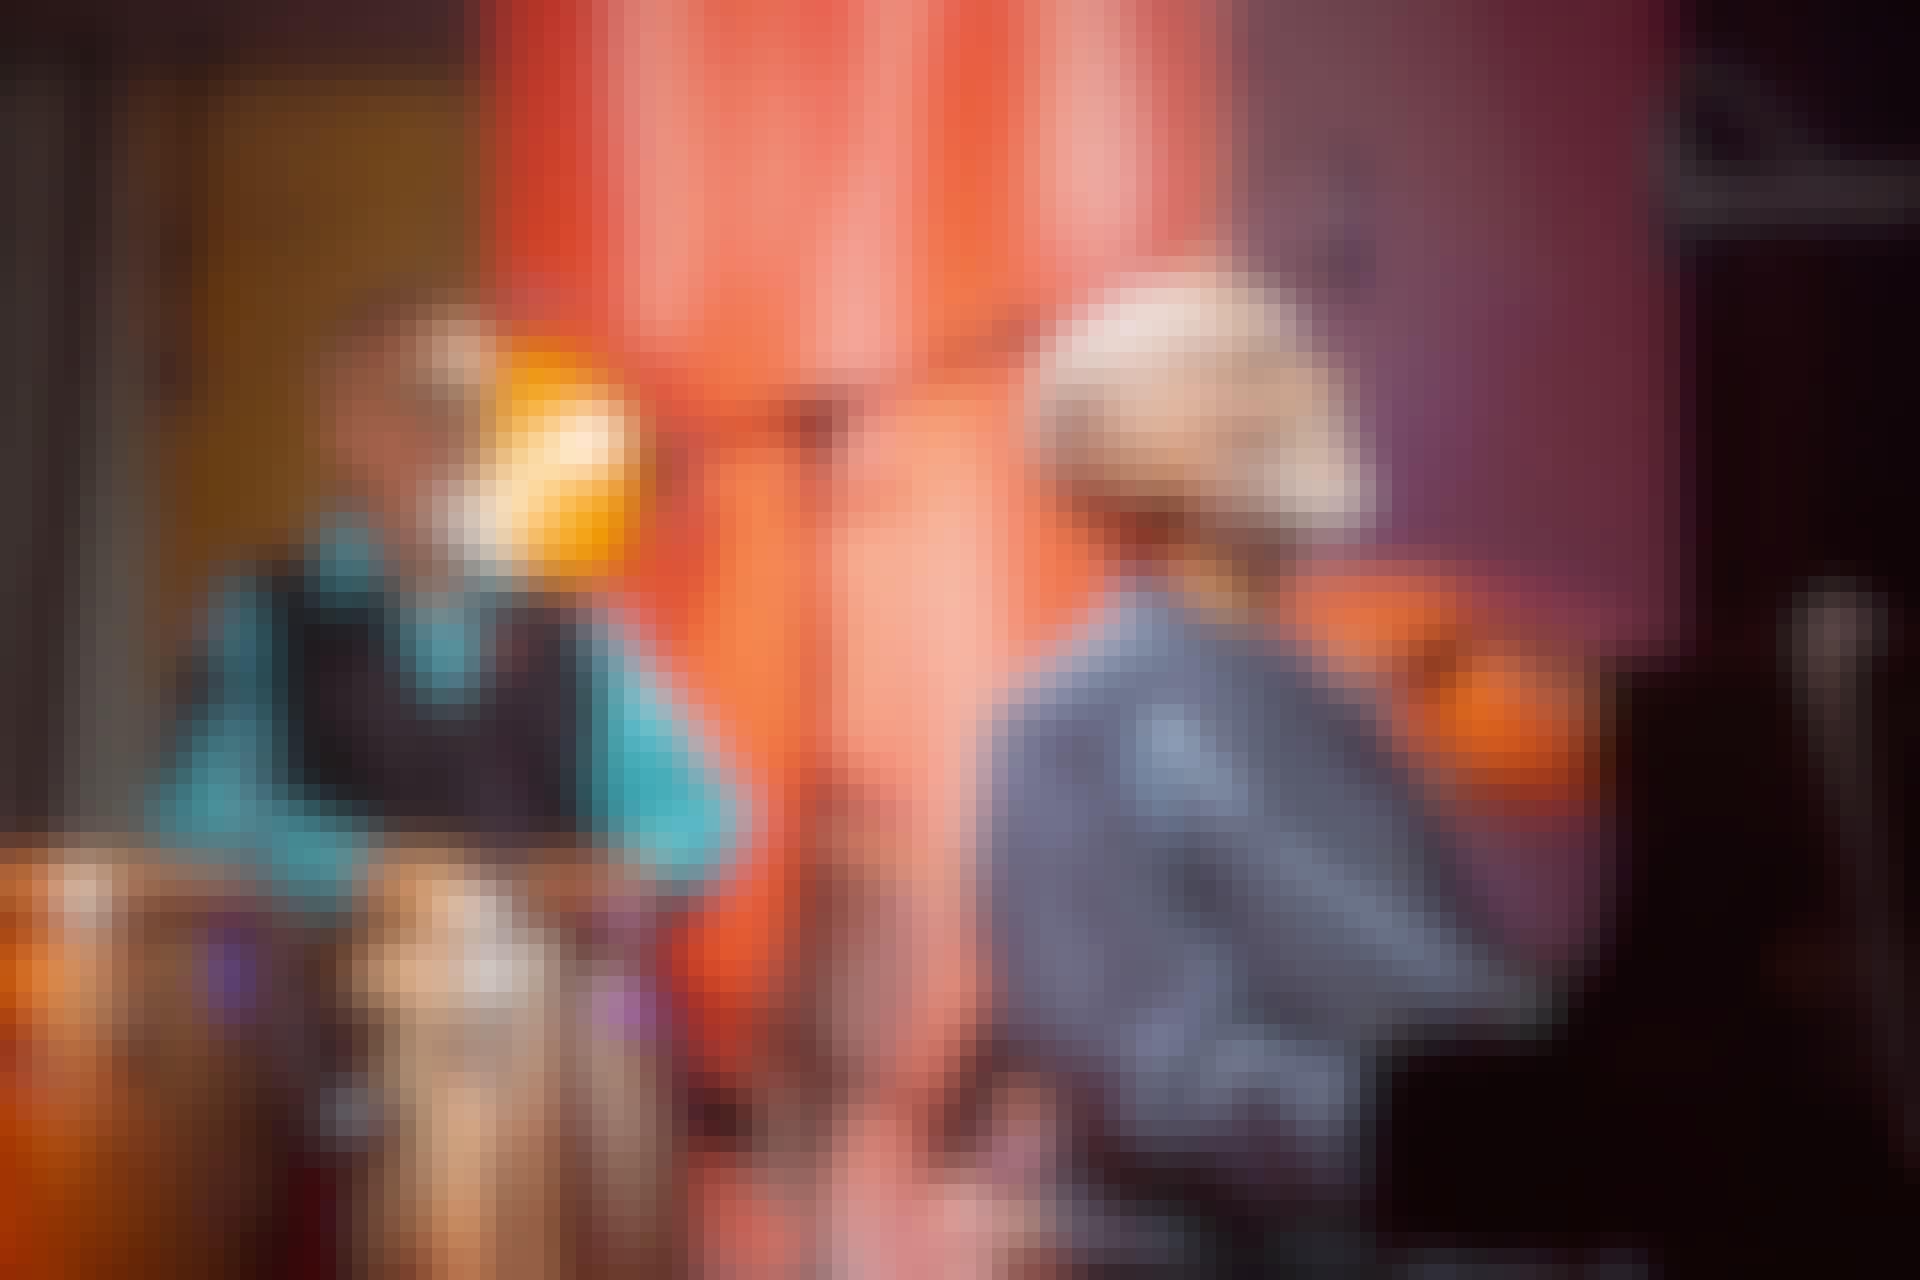 Piano jazz sessions de Ahmad Jamal, le 3 juillet 2019, a la Fond